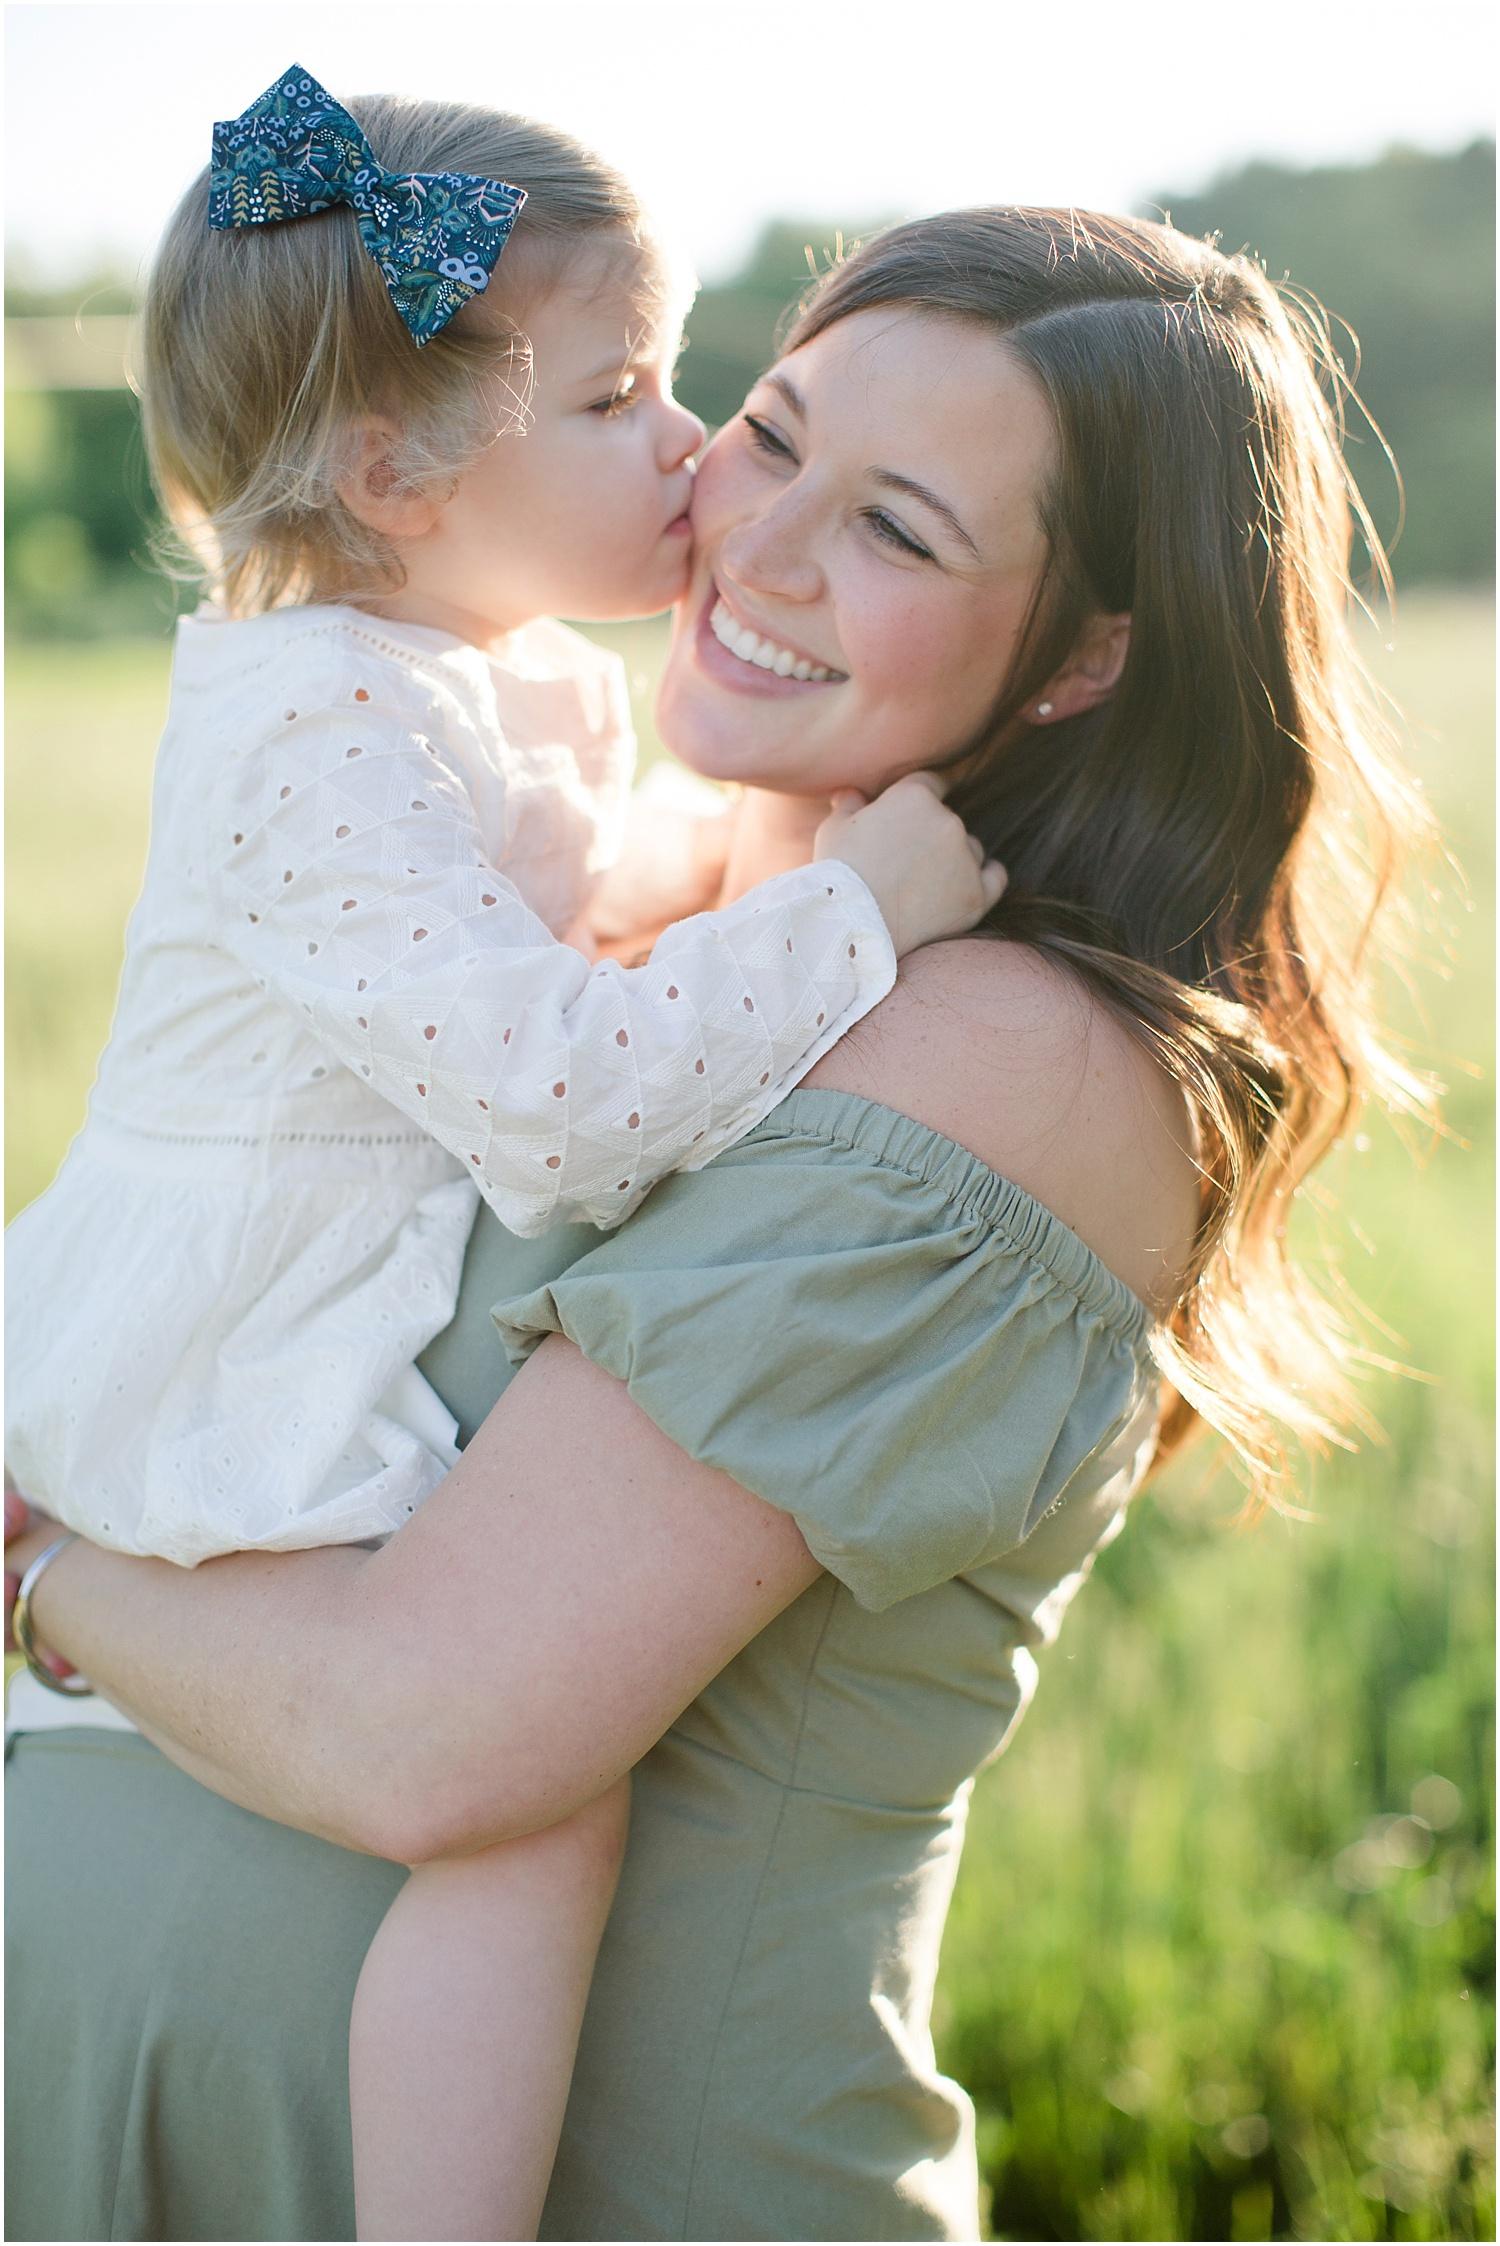 astleigh hill maternity session_0006.jpg